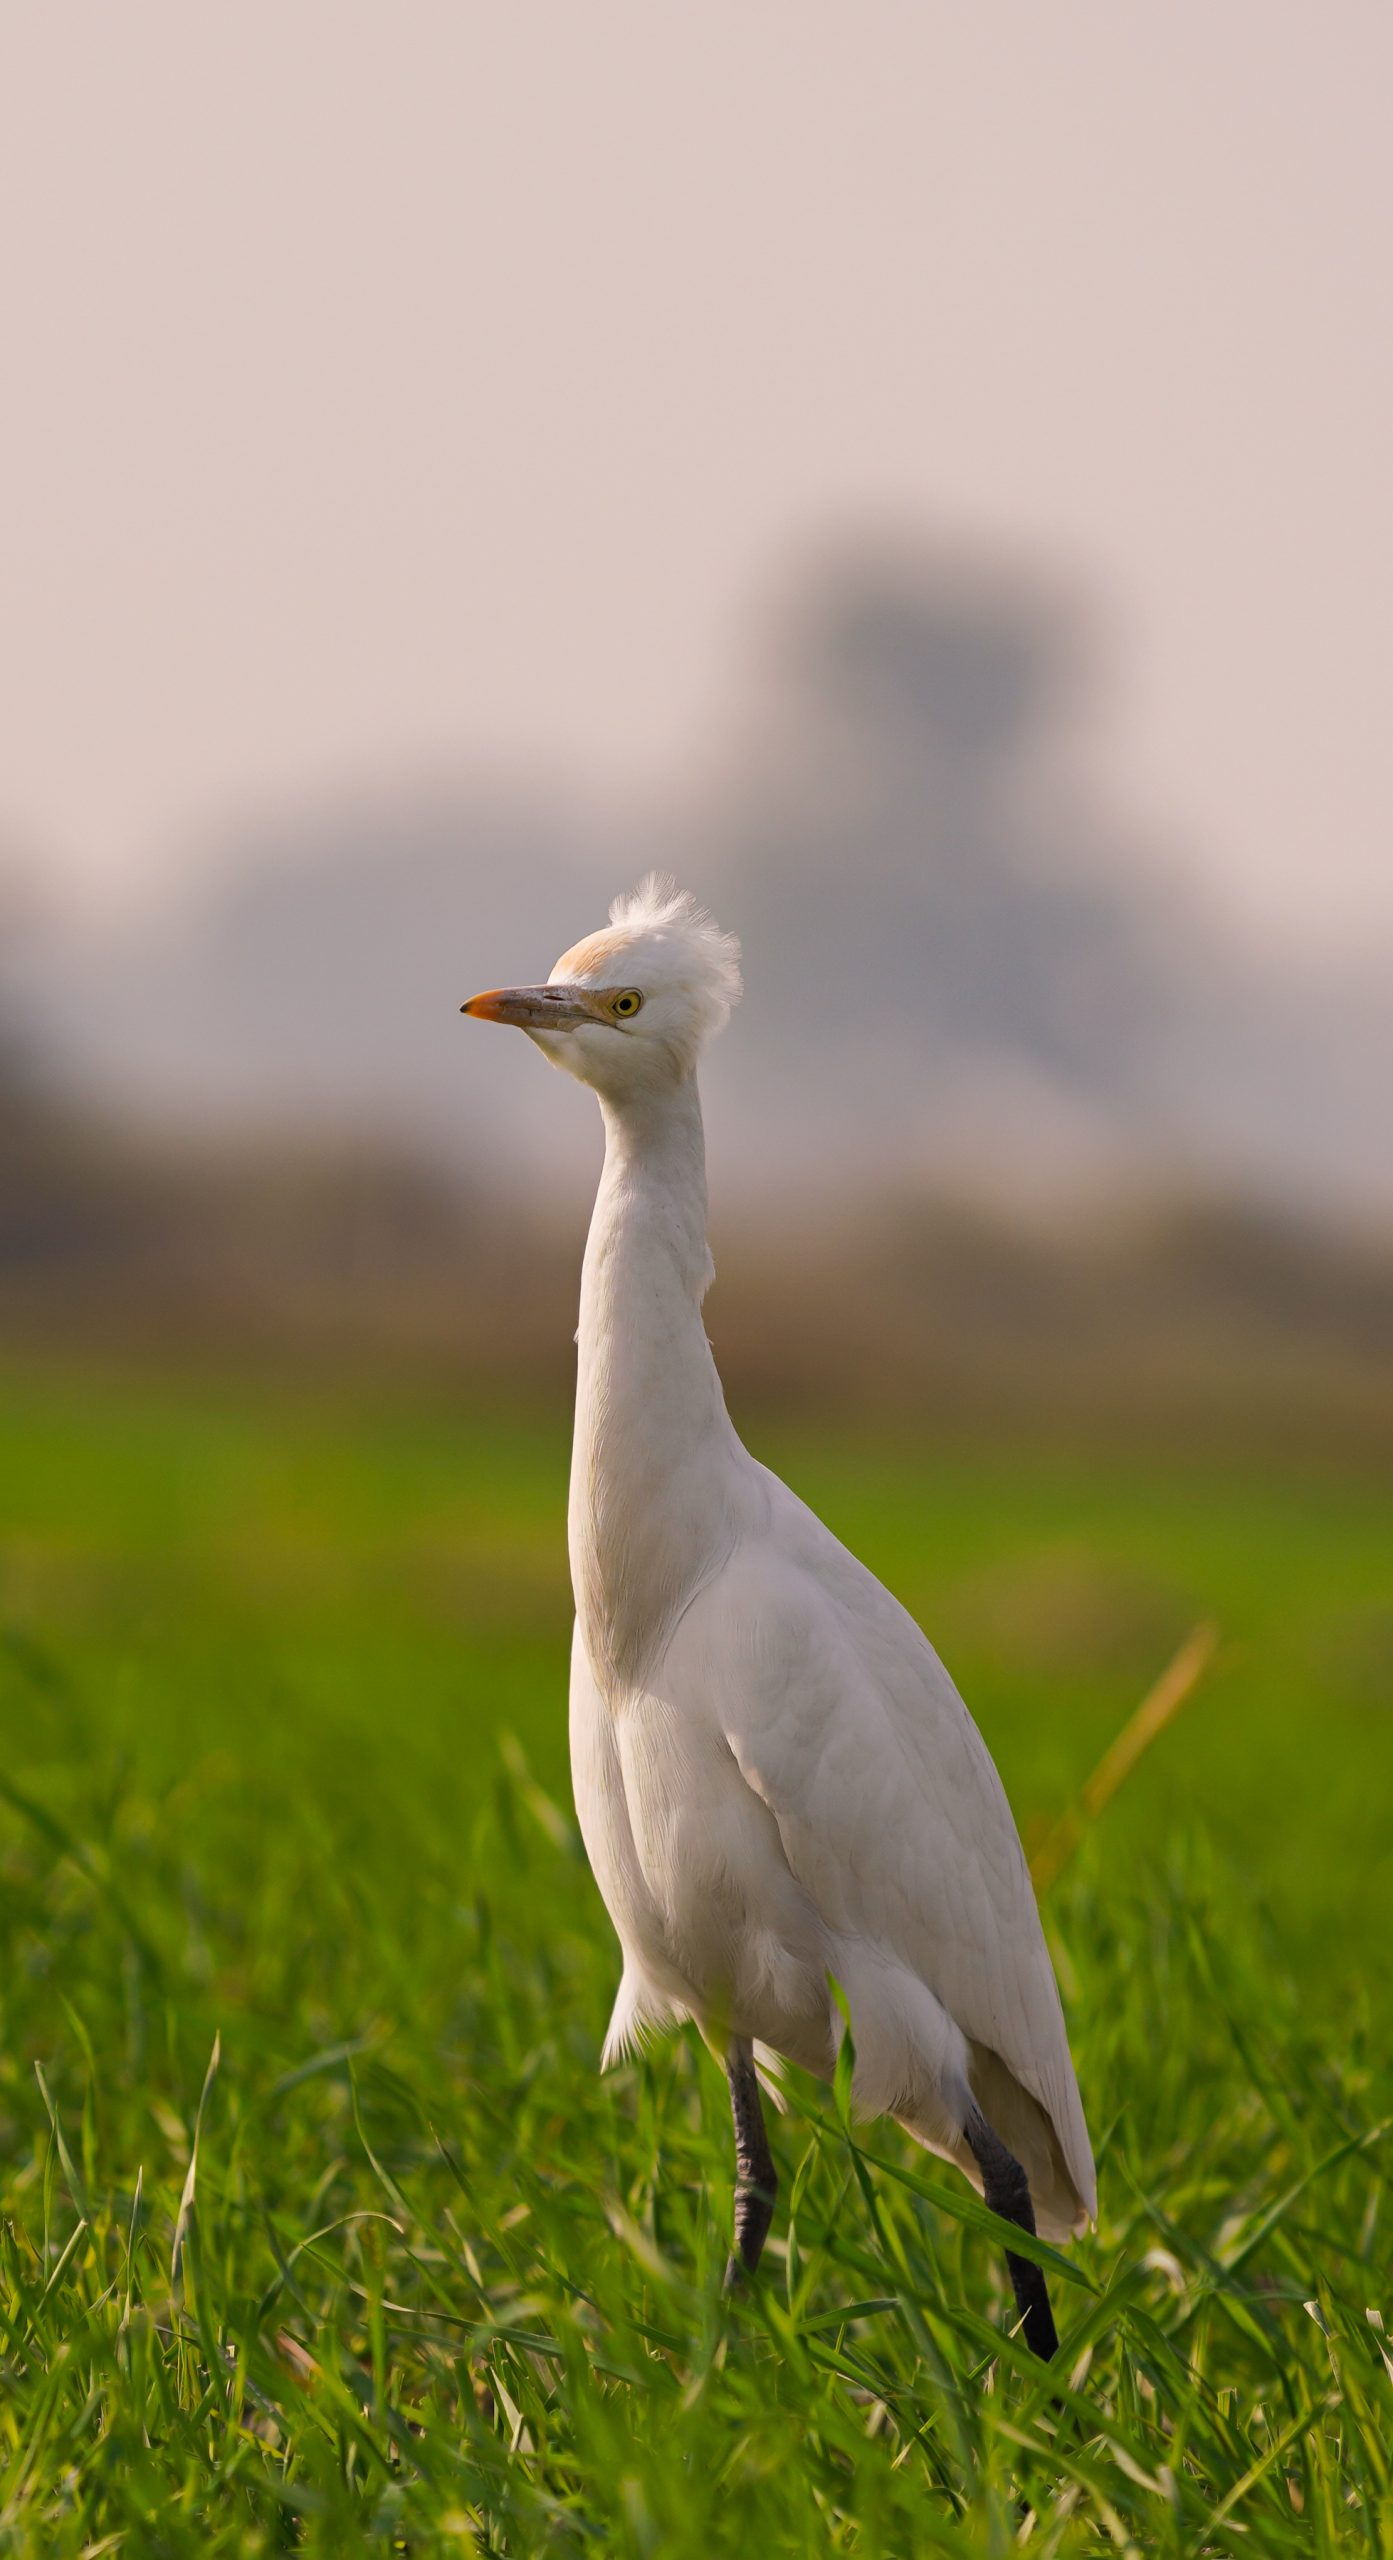 A cattle egret